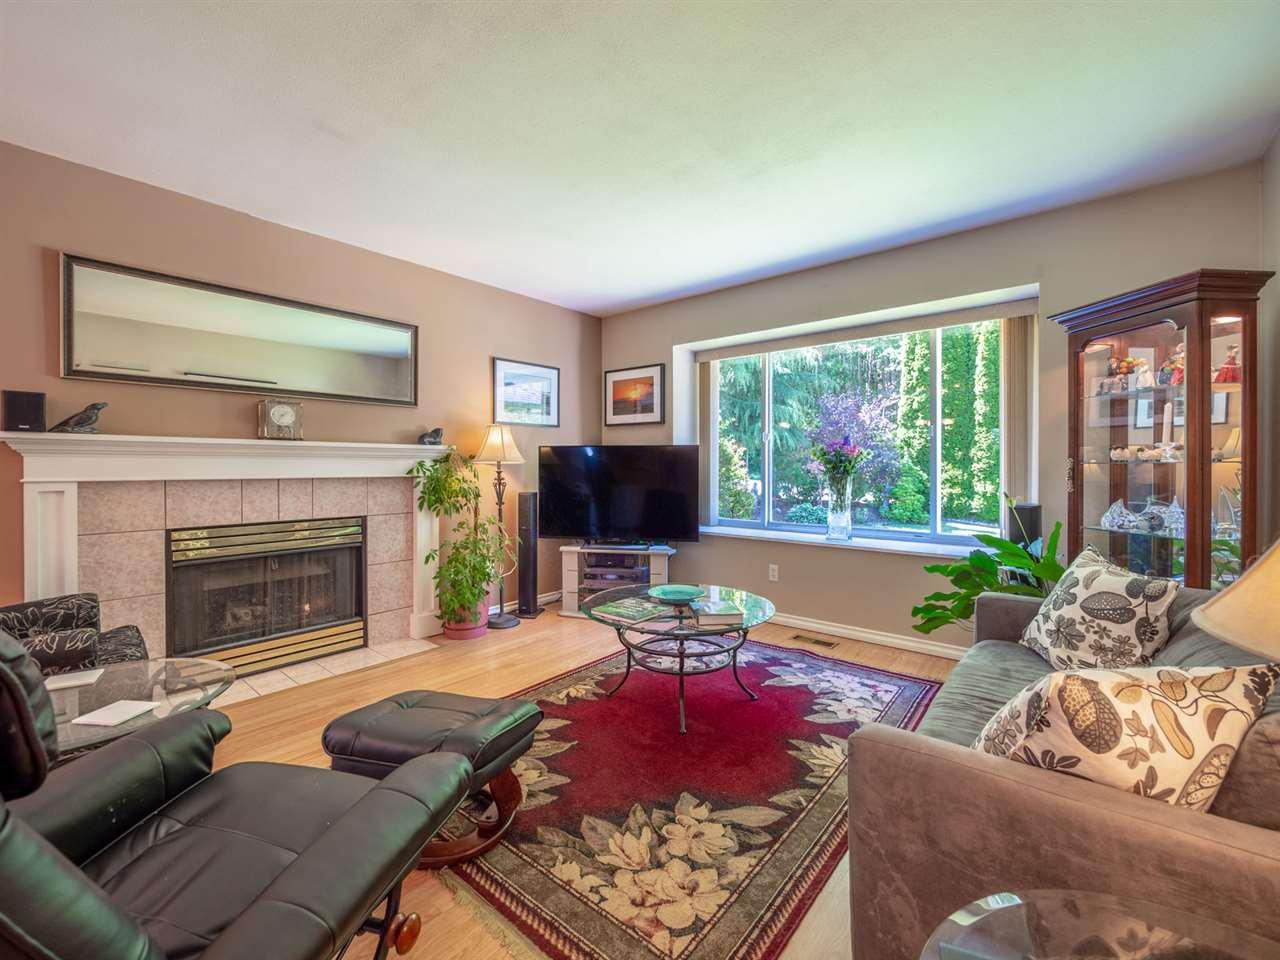 Main Photo: 5834 REEF ROAD in Sechelt: Sechelt District House for sale (Sunshine Coast)  : MLS®# R2442223